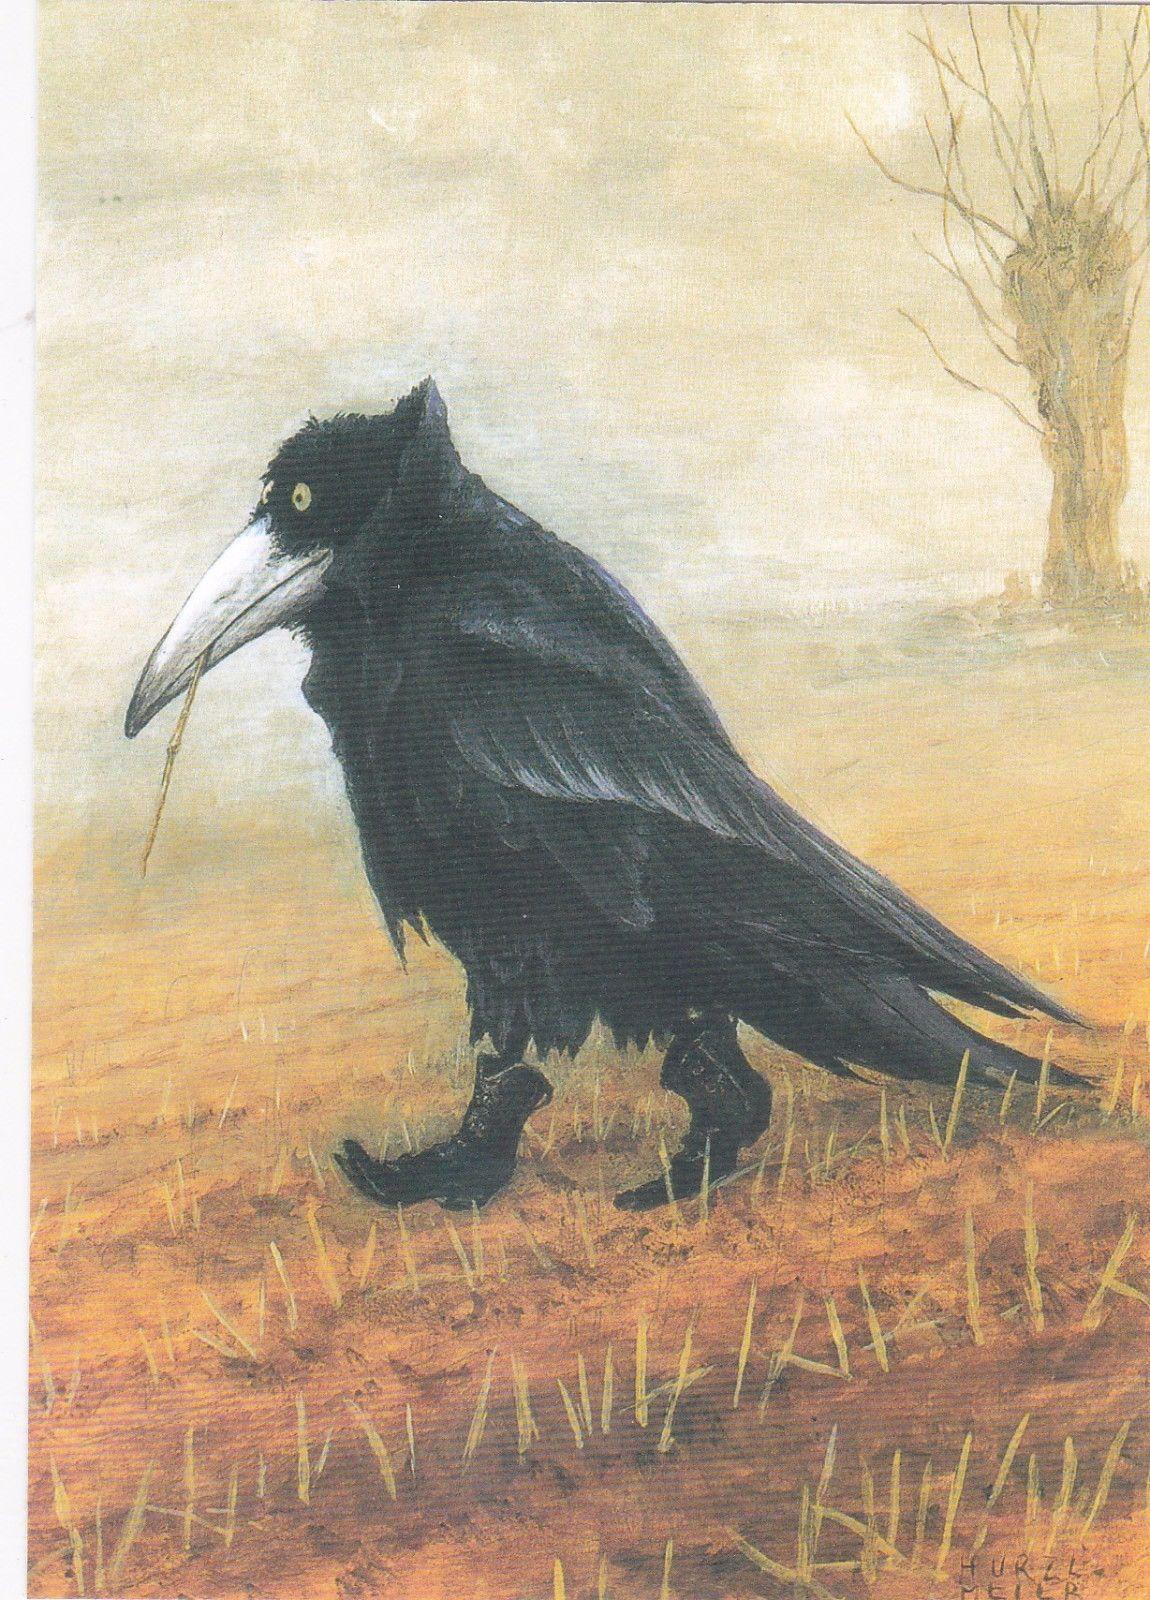 Rudi Hurzlmeier Postkarte Krähe